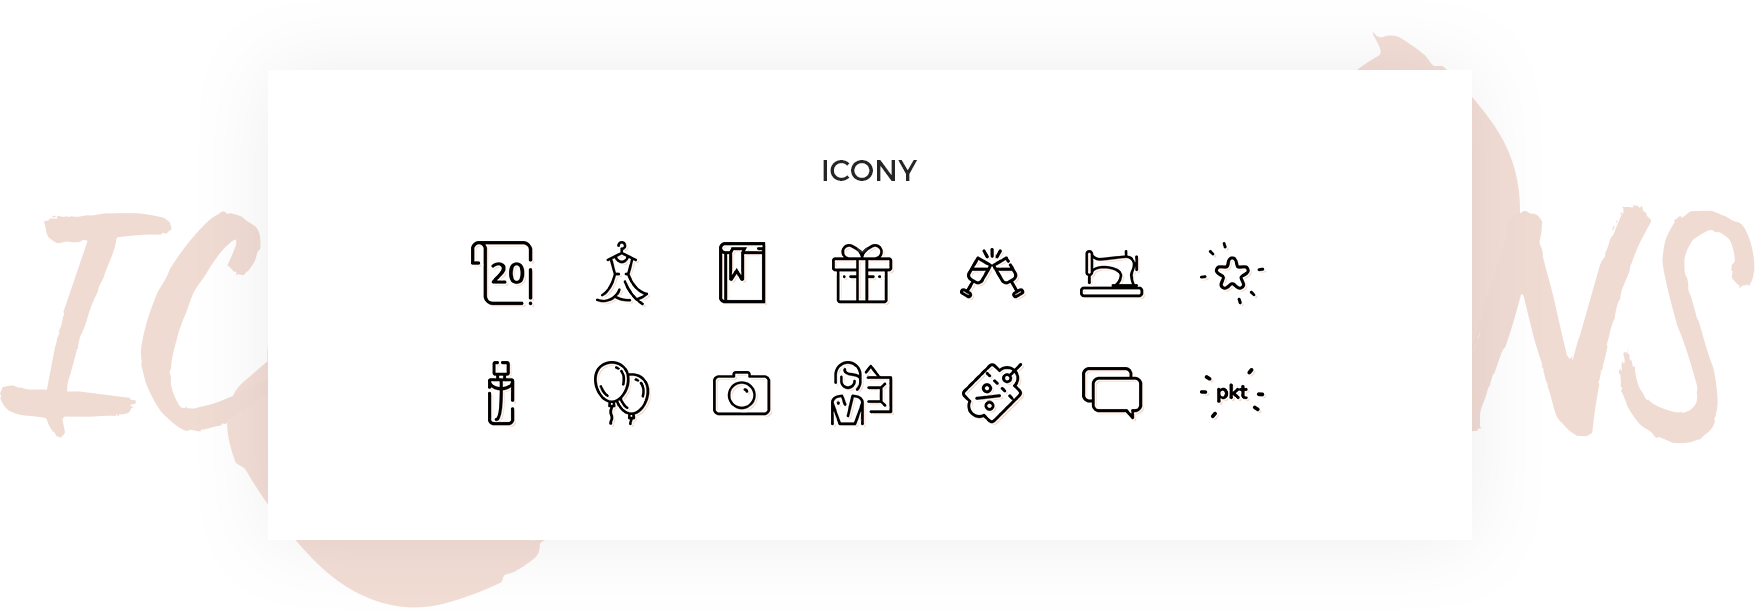 indywidualne ikony orsay 20 lat